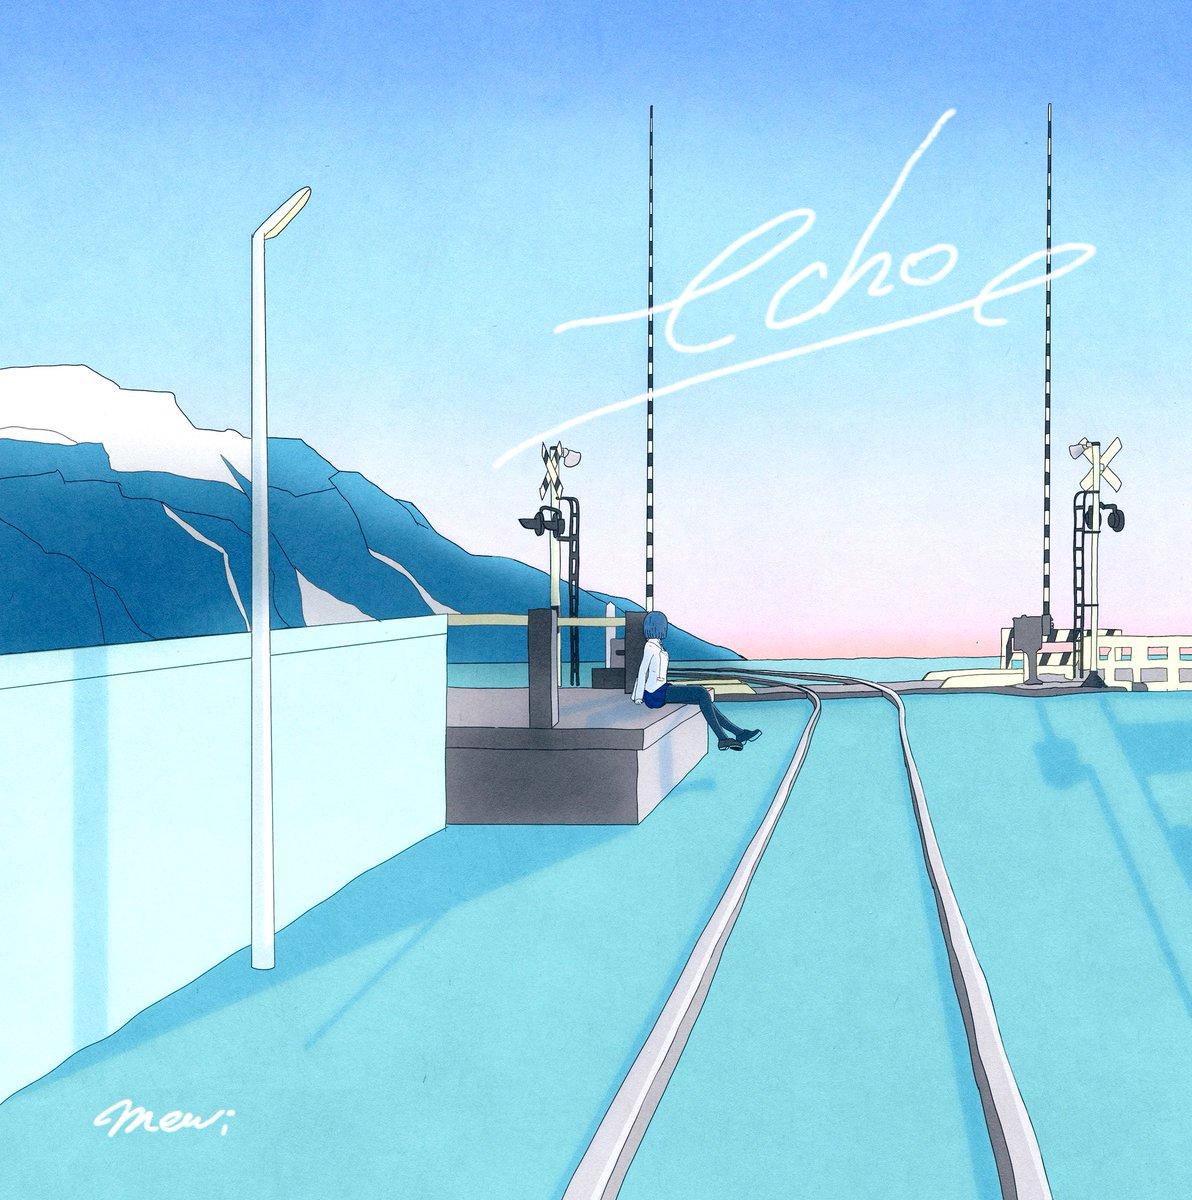 【 New Single 💿】2.15(土) 新曲『echo』Release❕心象風景に委ねて。🎧 各種配信サイトURL ▷Apple Music▷Spotify▷LINE MUSIC▹Google Play